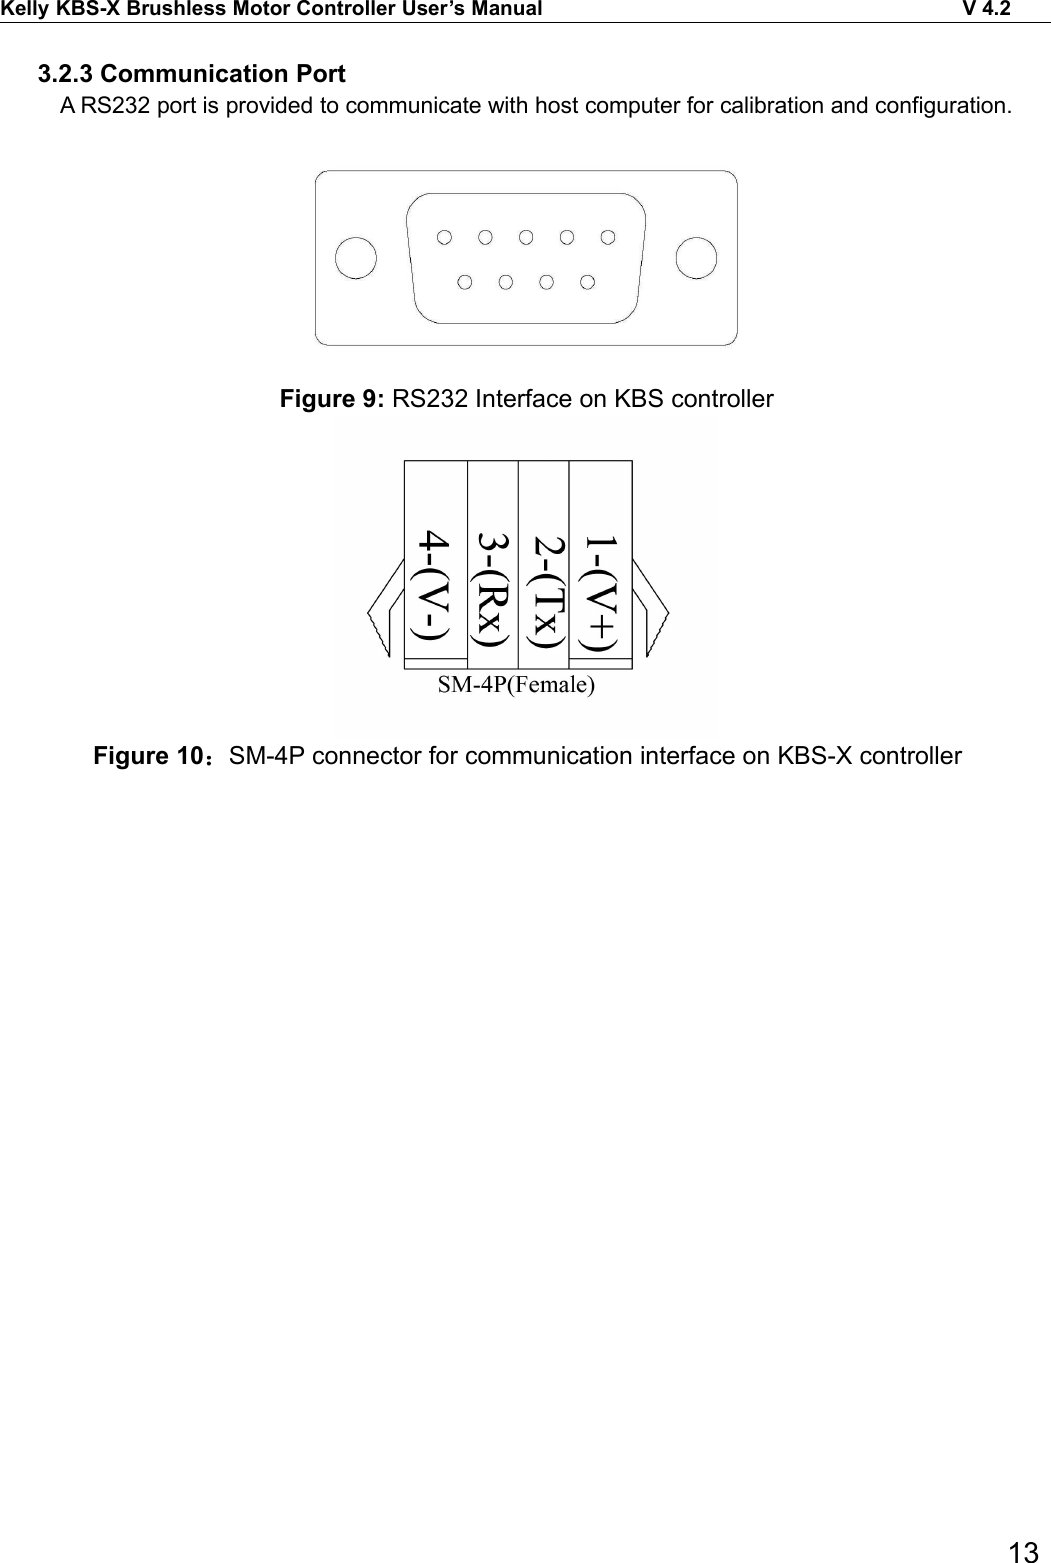 Kelly KBS XUser Manual